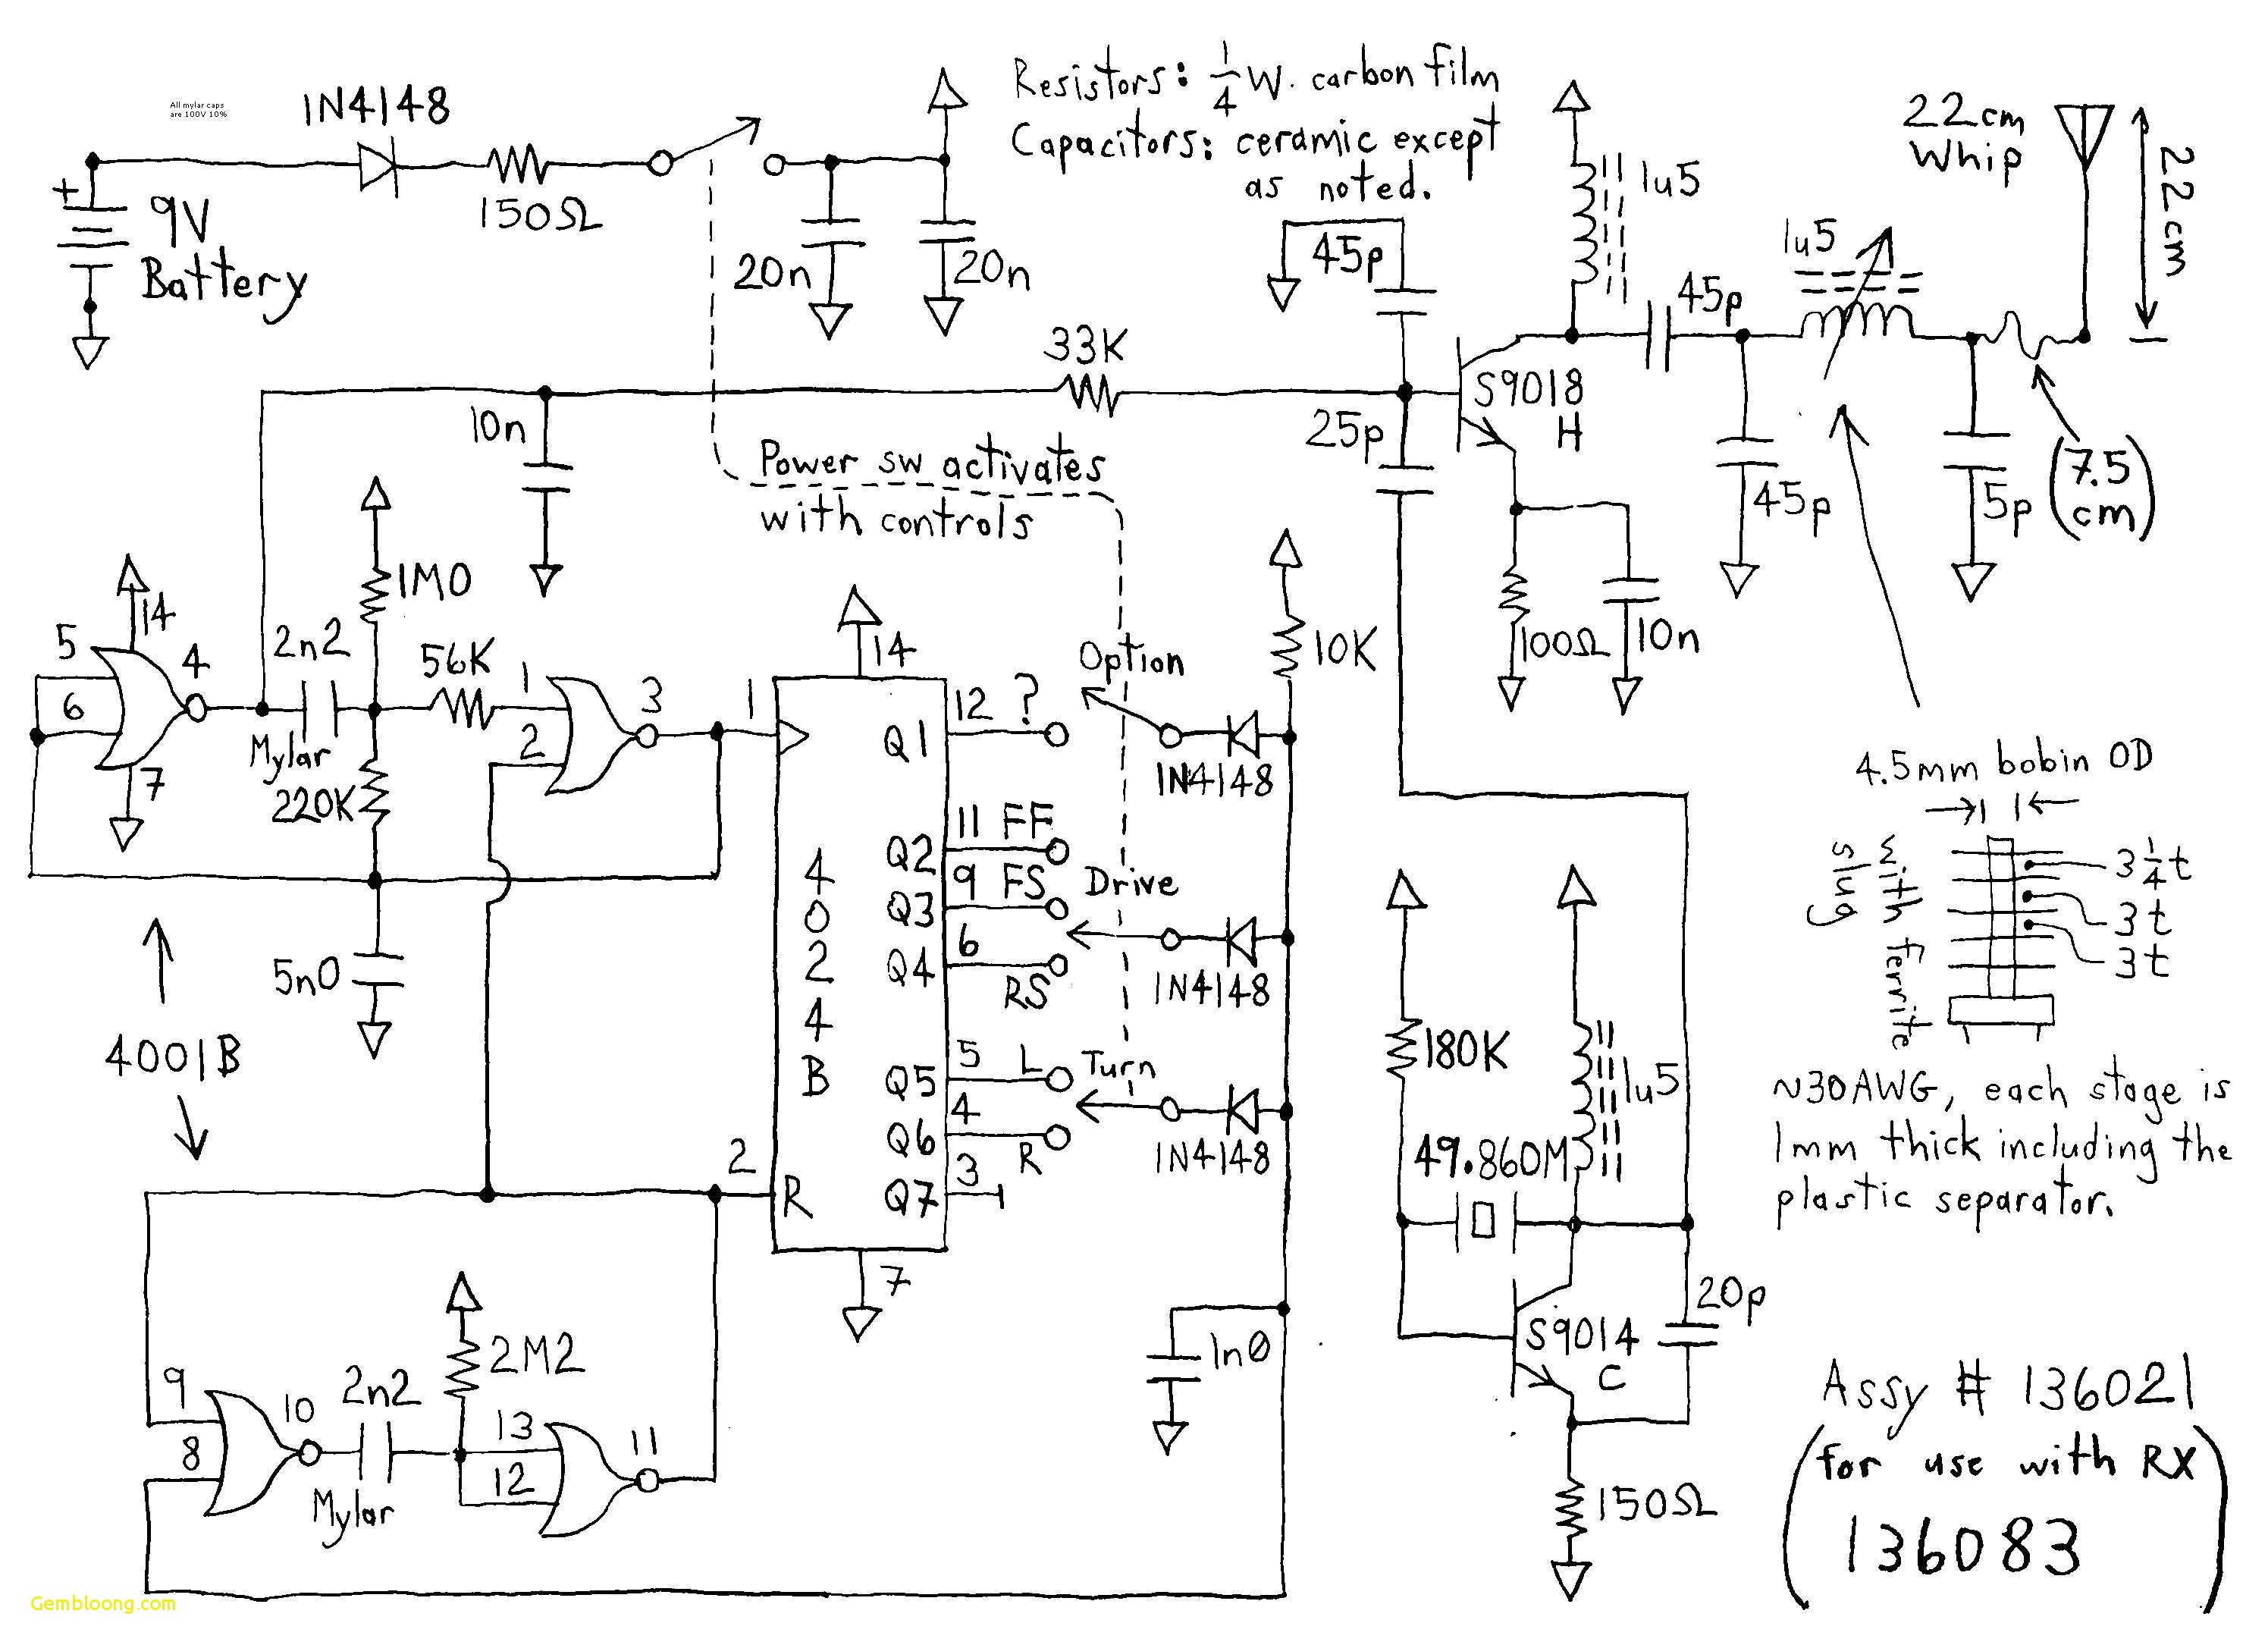 Car Alternator Connection Diagram Free ford Xy Gt Wiring Diagram Xy Alternator Wiring Diagram & Cs144 Of Car Alternator Connection Diagram